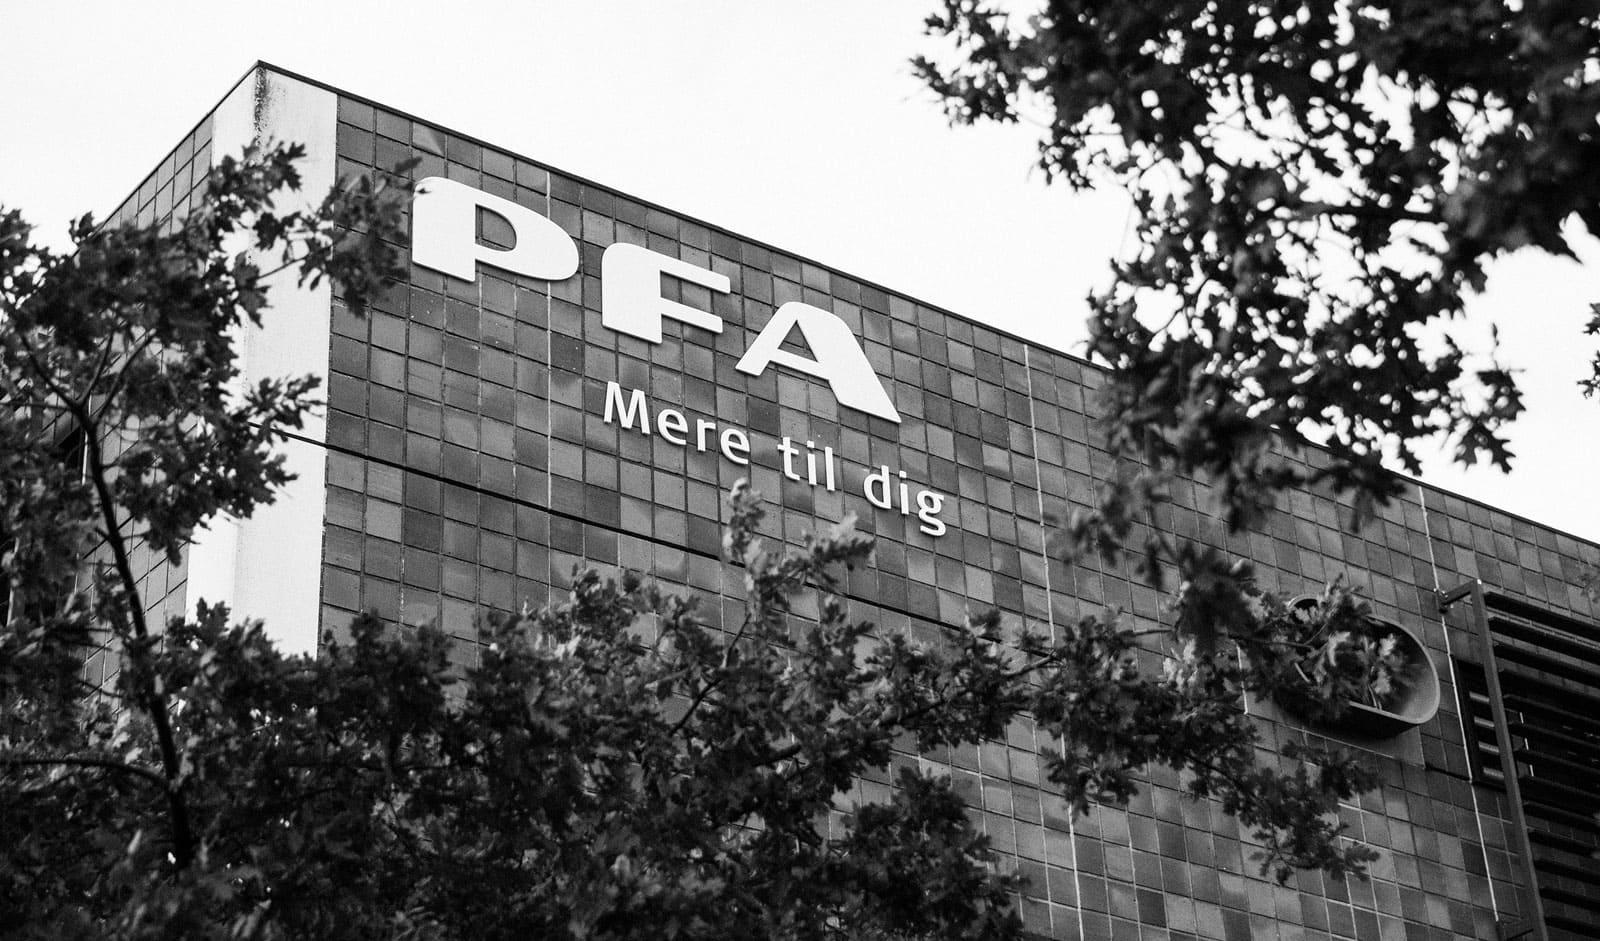 PFA er Danmarks største pensions- og forsikringsselskab